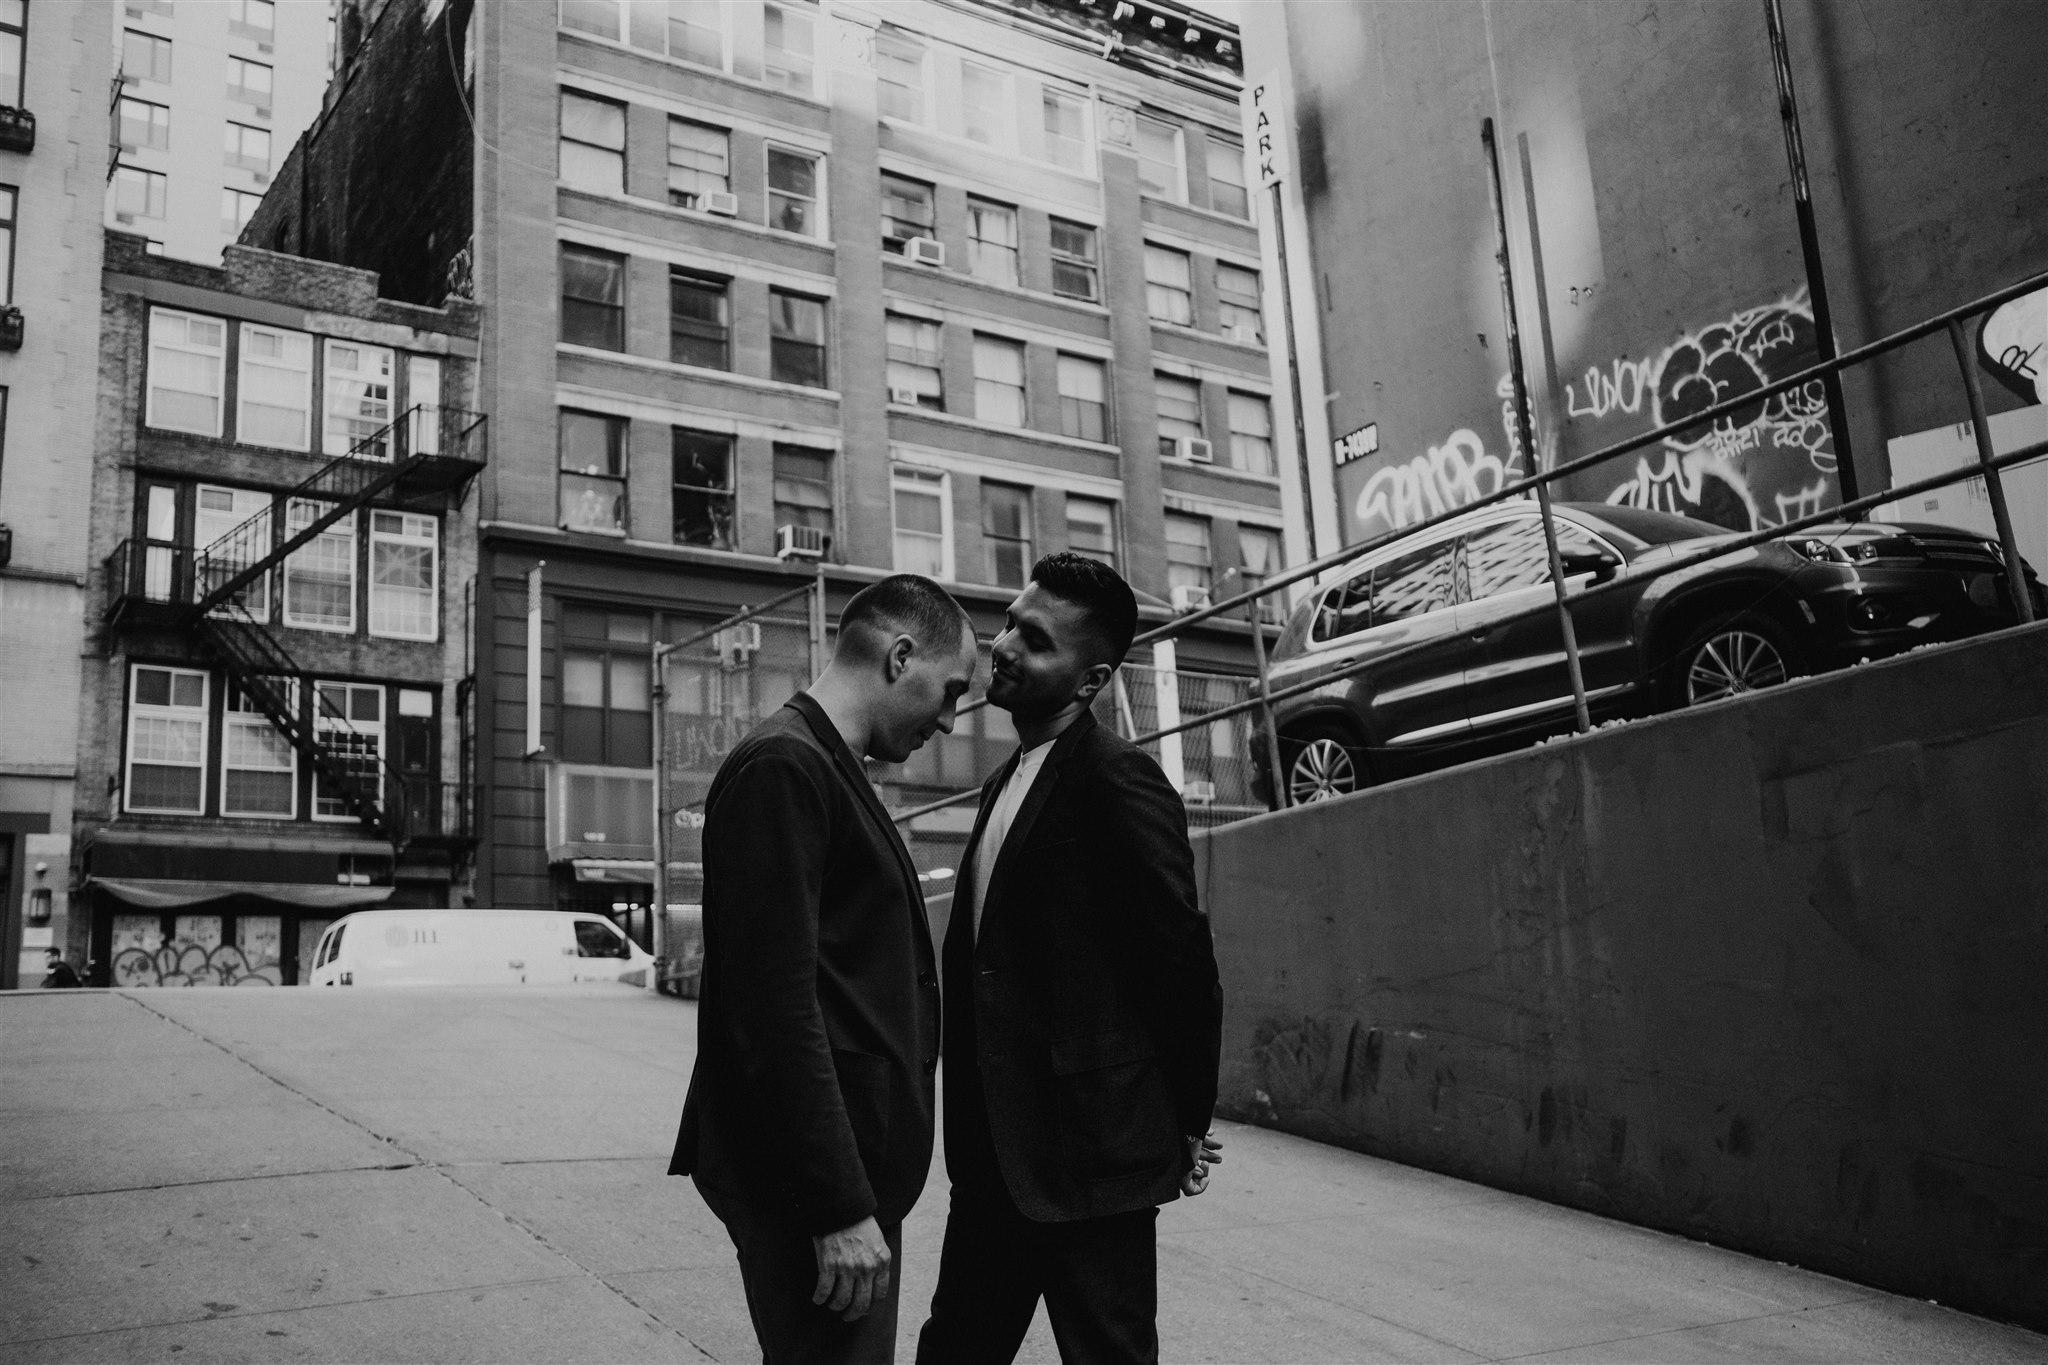 lbgtq-gay-wedding-elopement-photography-chellise-michael-photography298.JPG